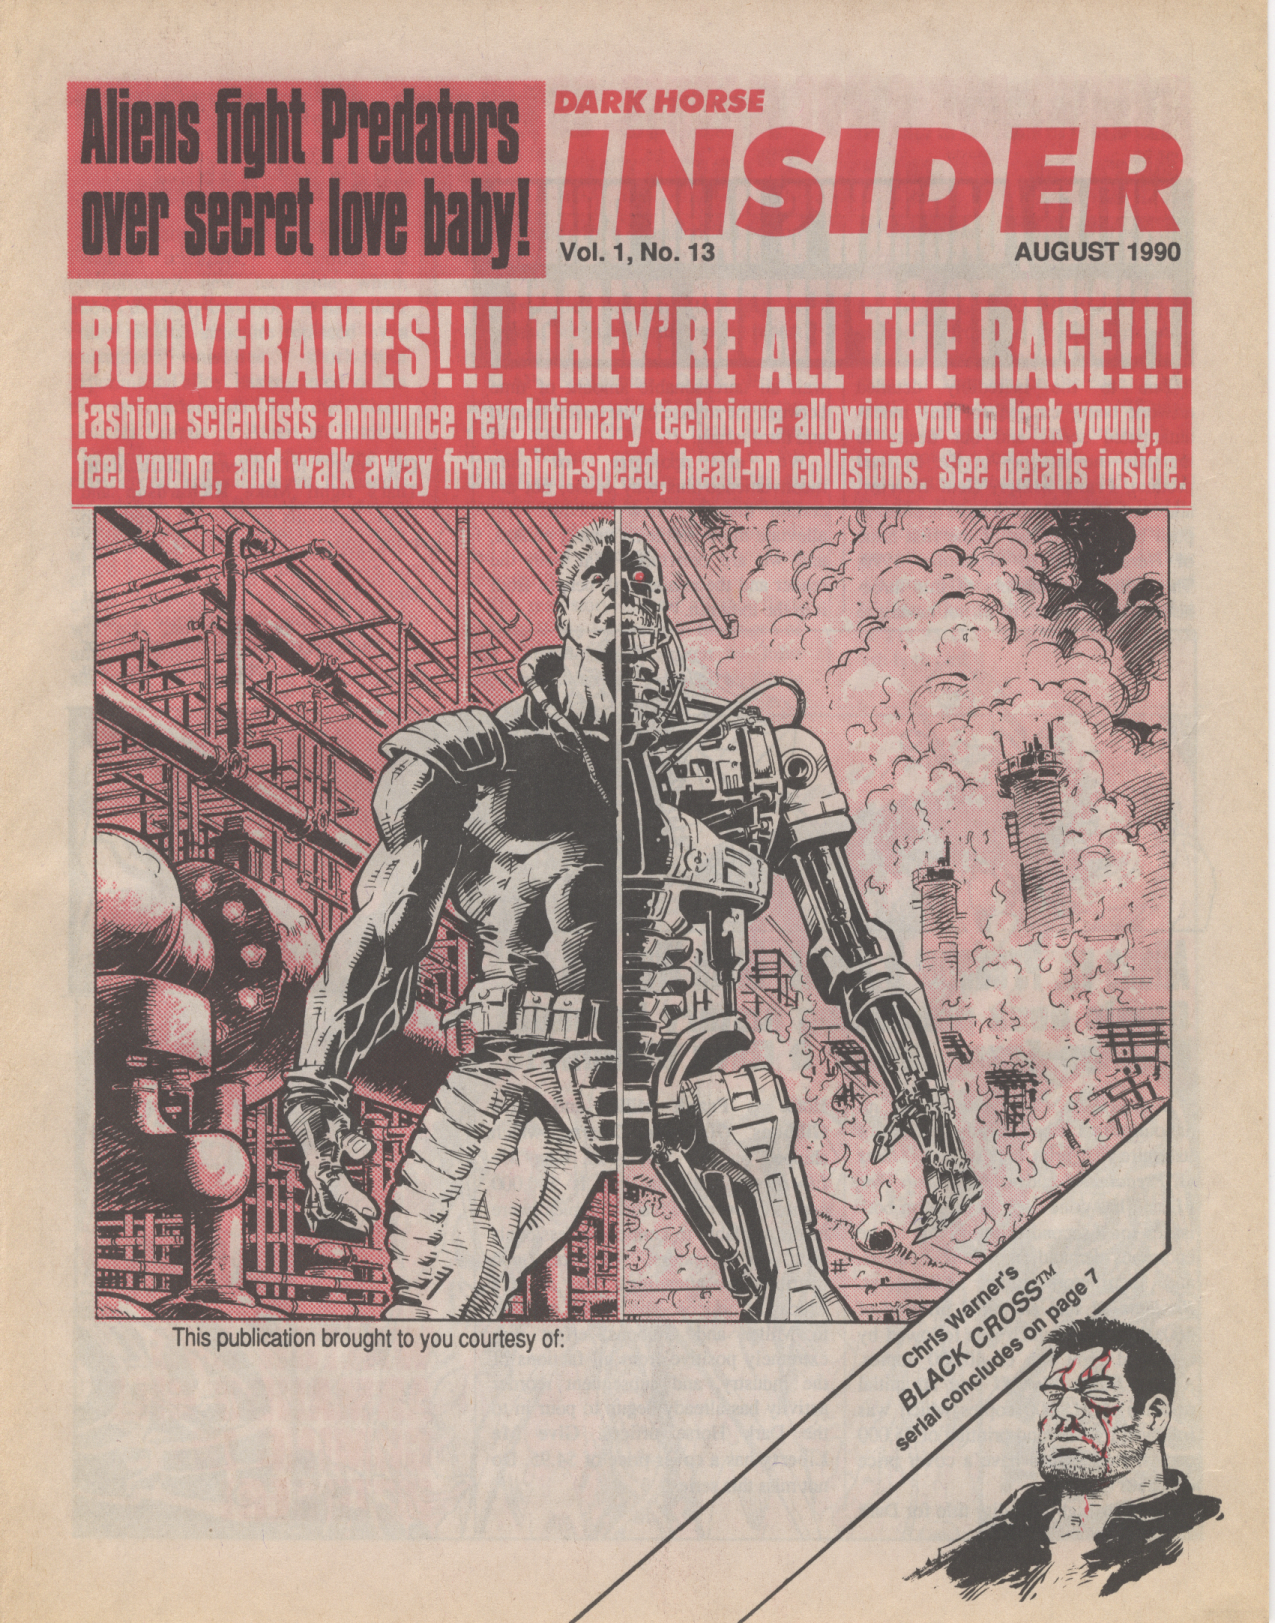 Time Capsule: Dark Horse Insider August 1990